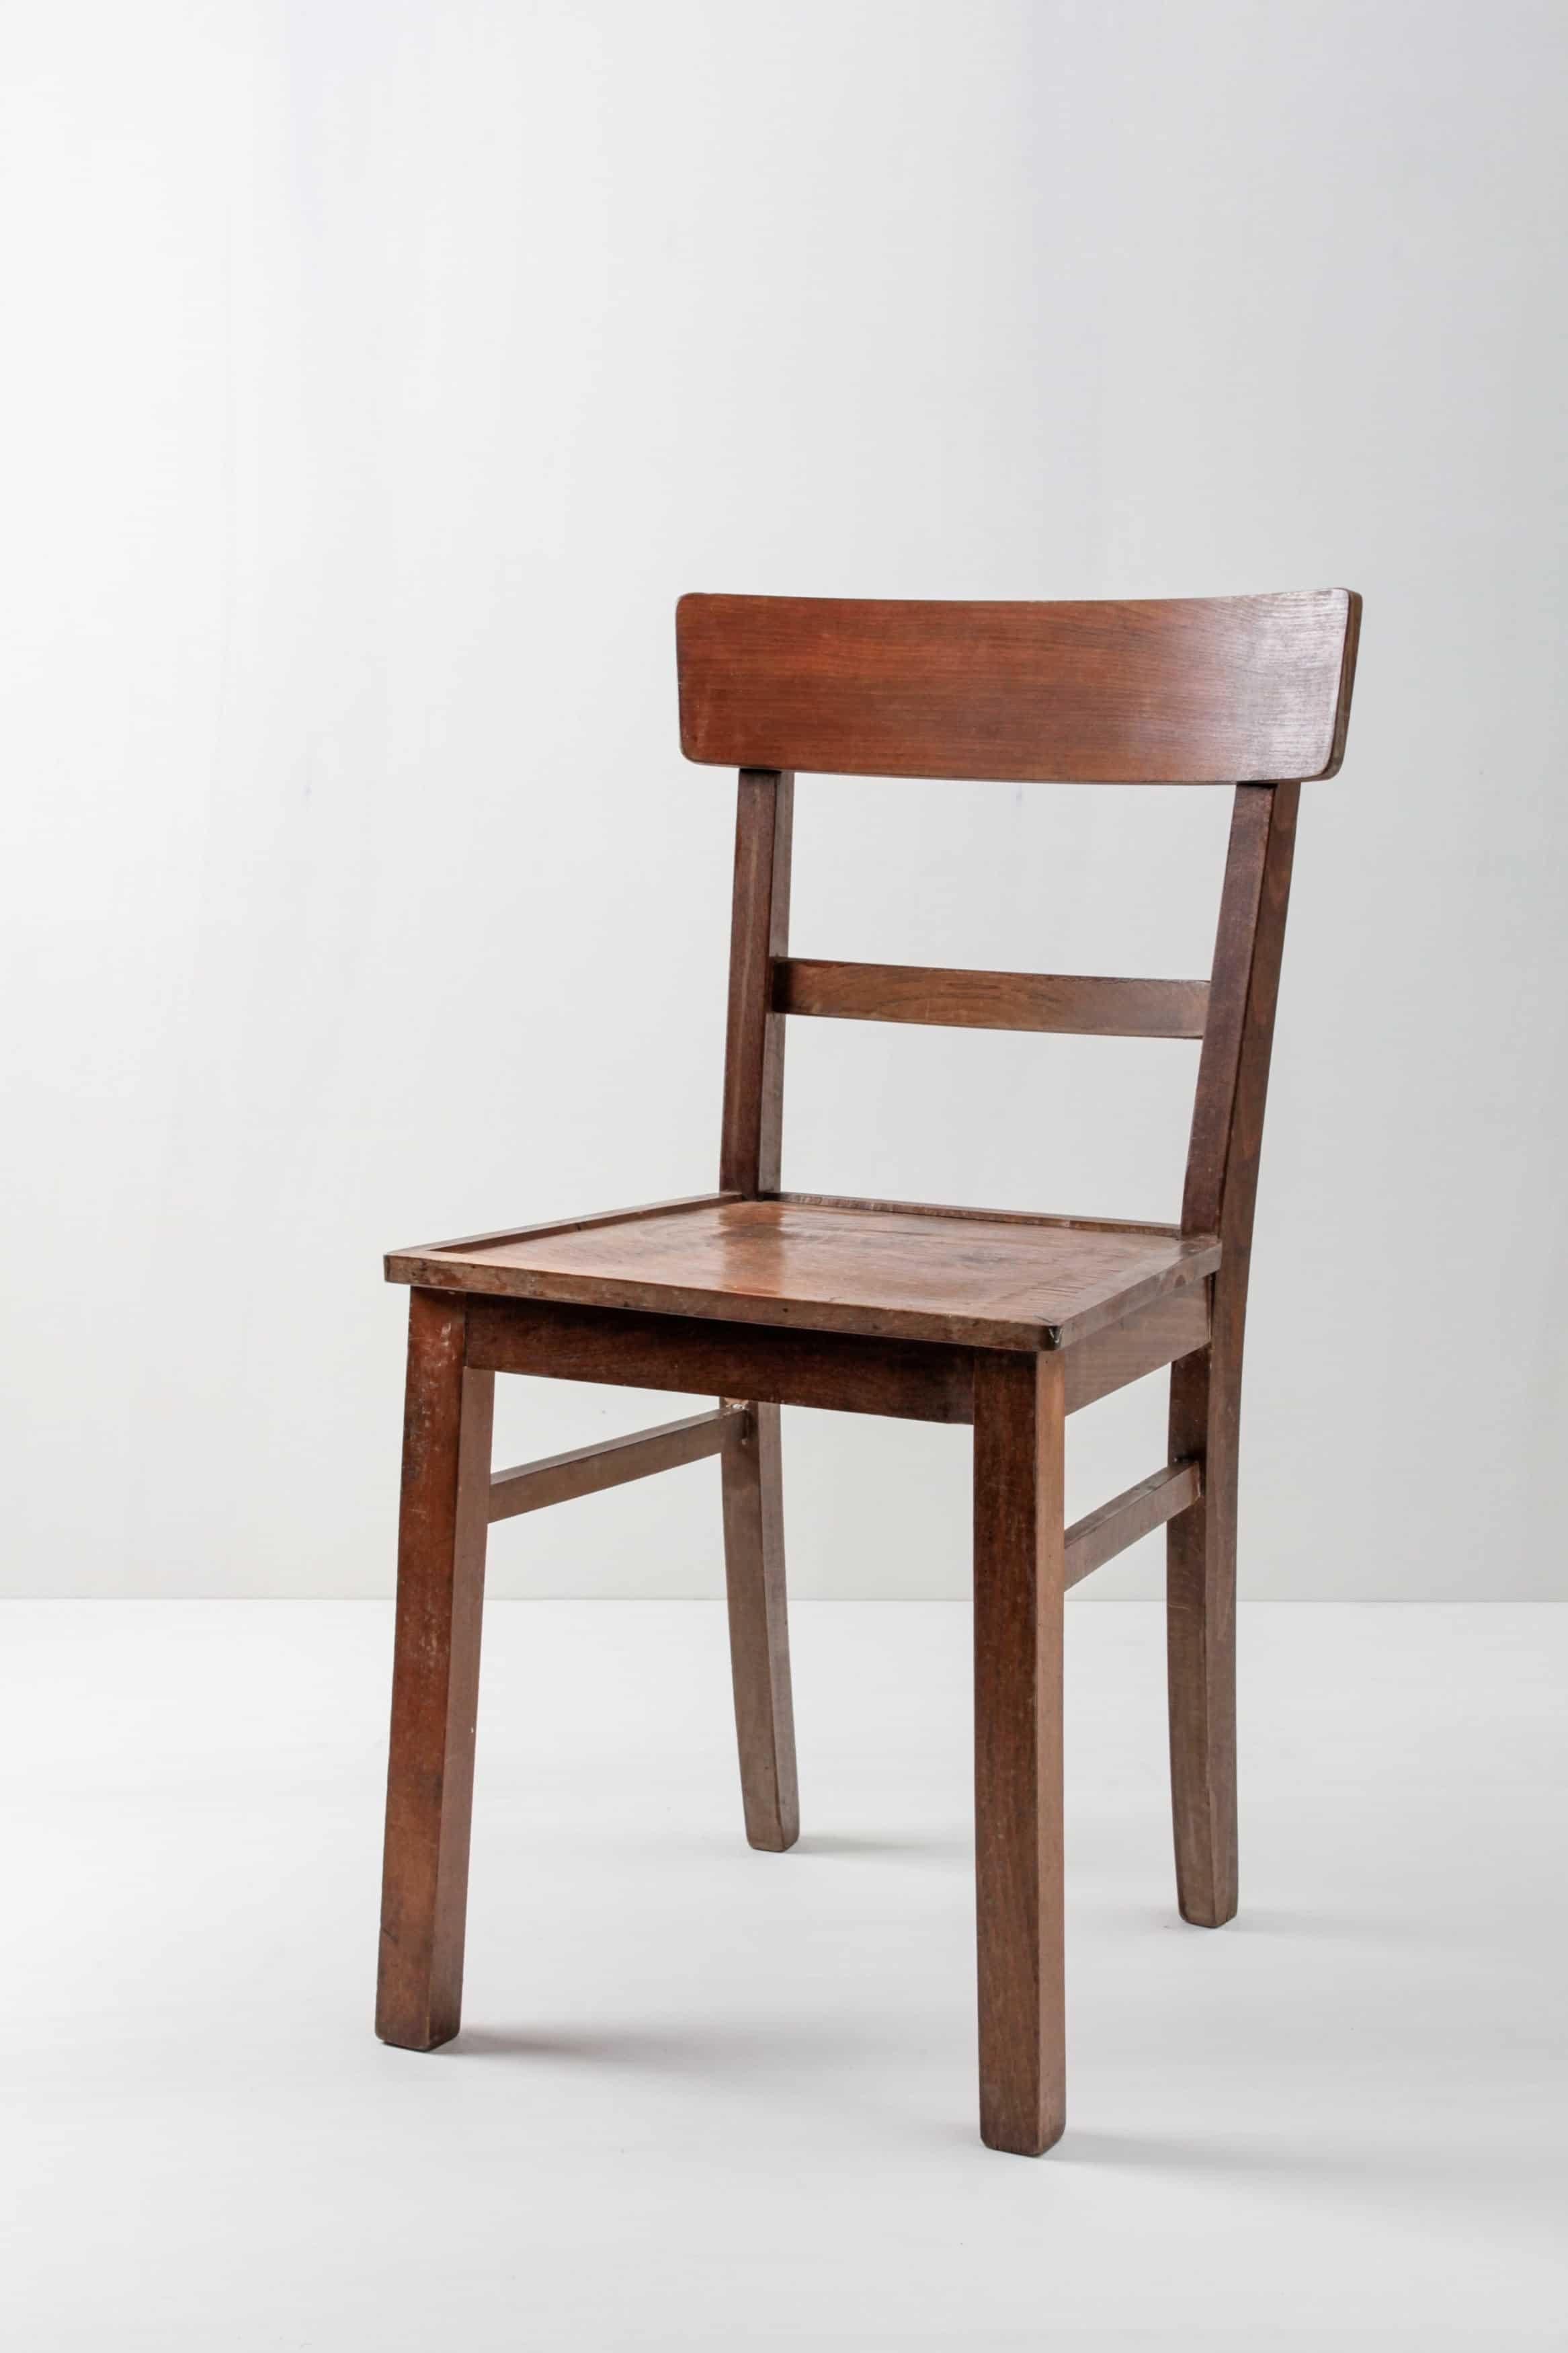 Chairs furniture rental, Berlin